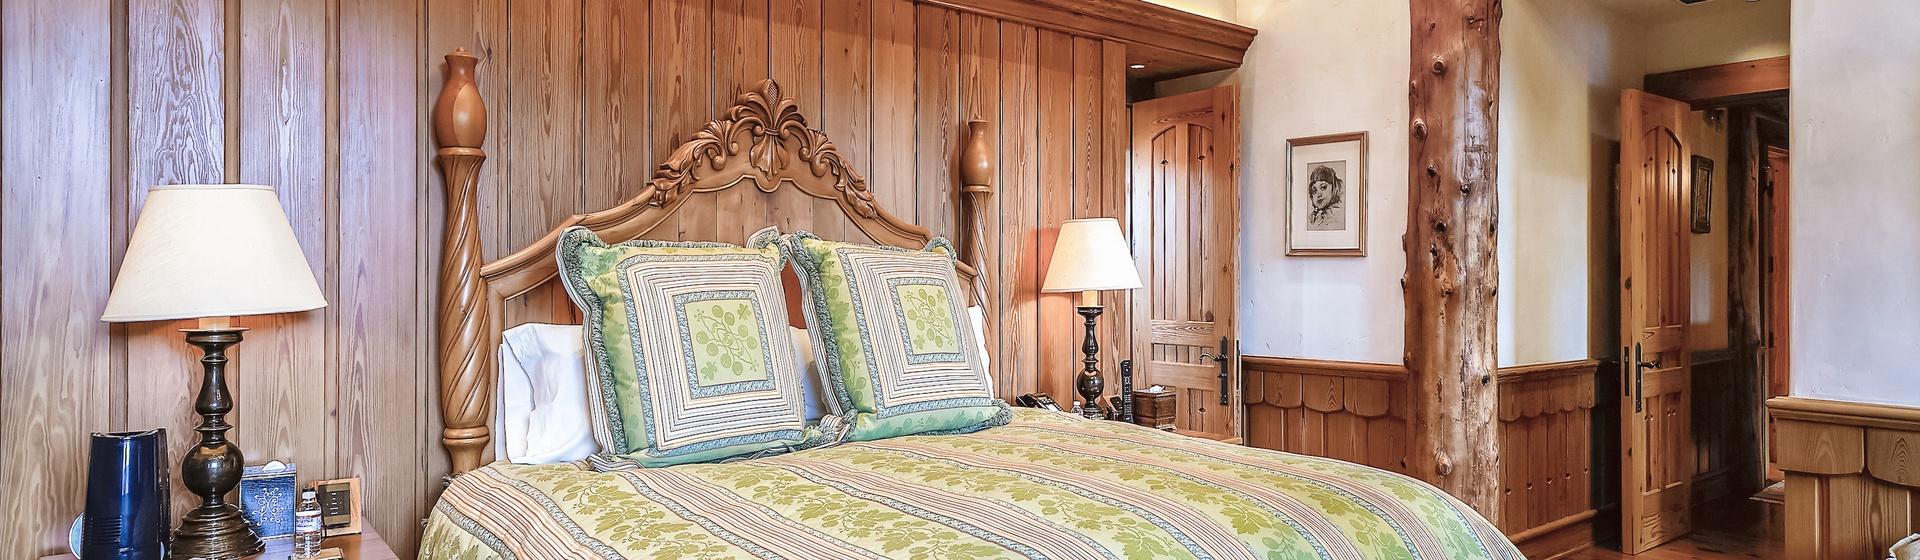 9.9-Telluride-Sleeping-Indian-Ranch-Swiss-Suite-Master-Bedroom-I-2-web.JPG